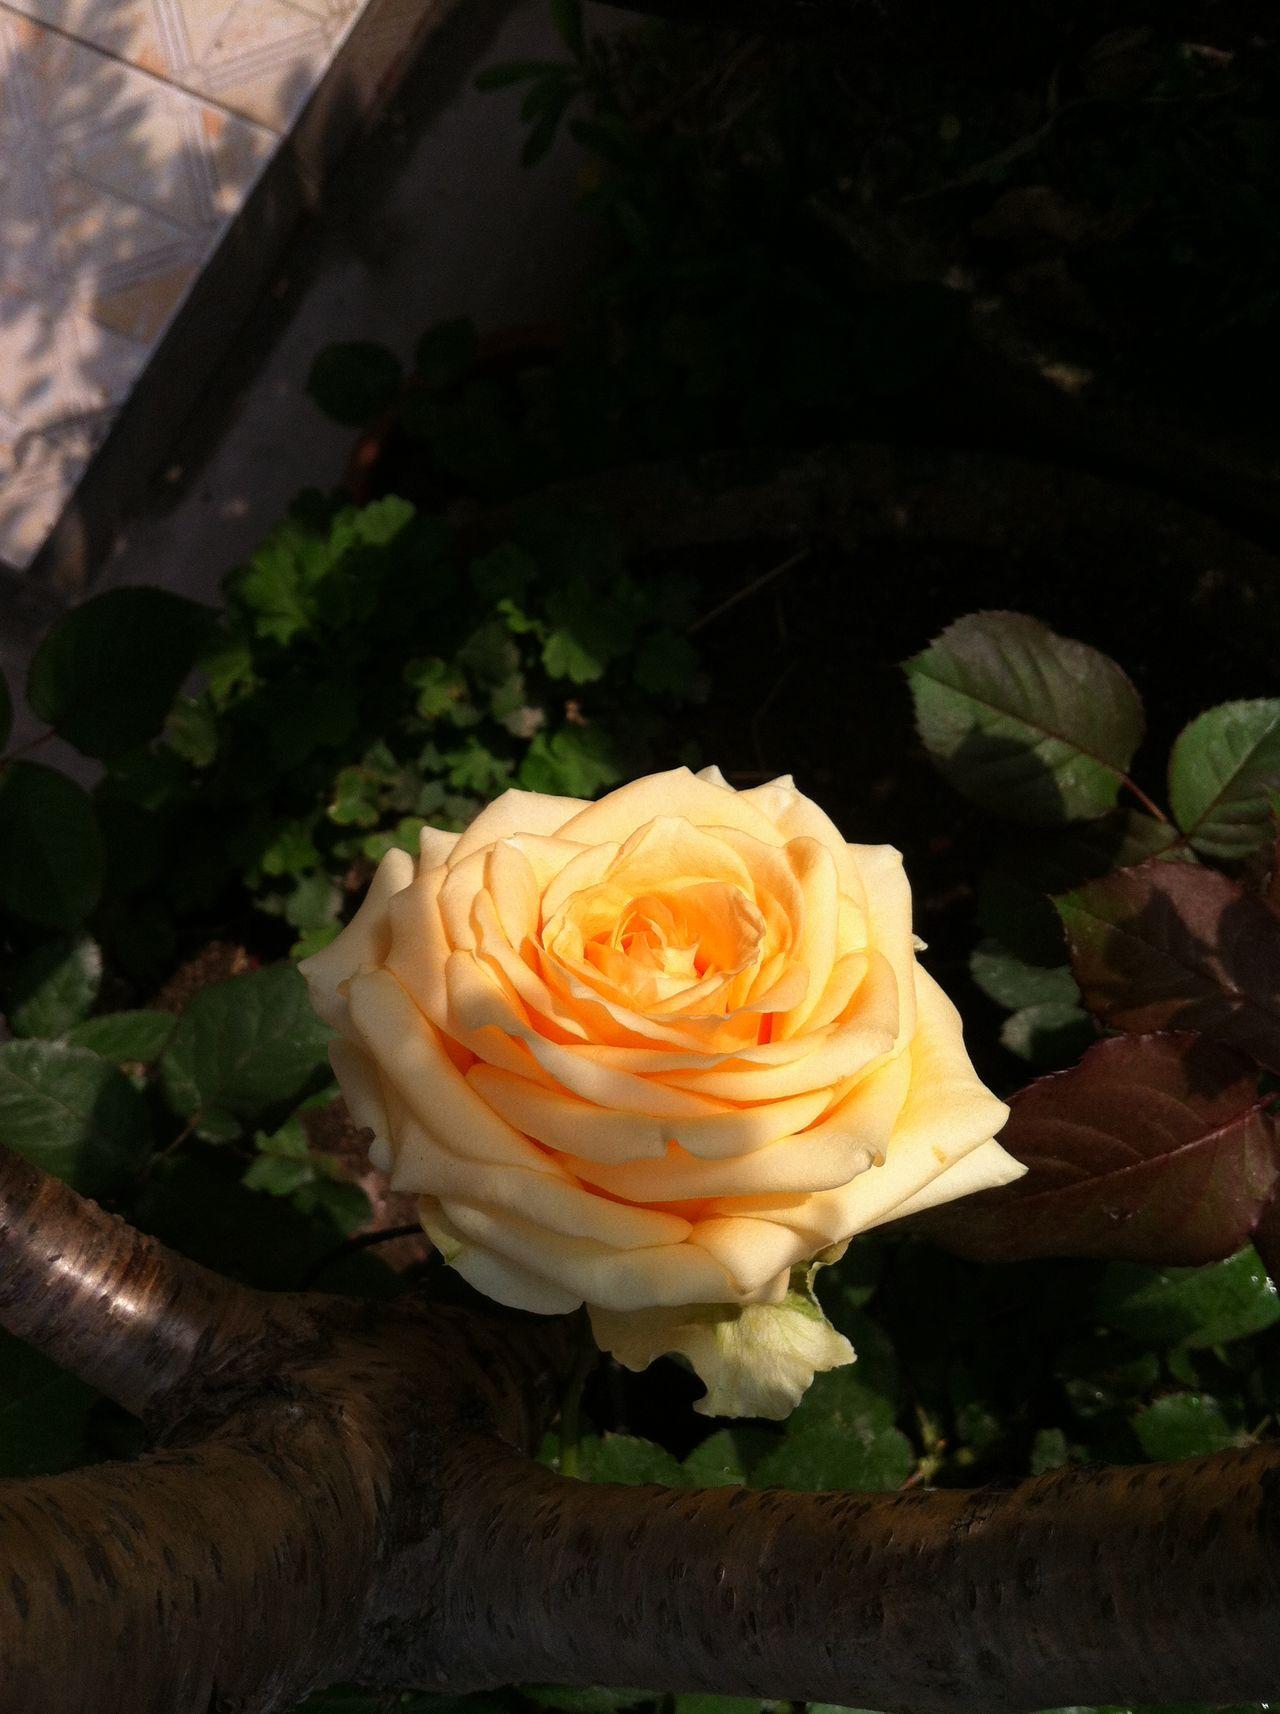 Flower Yellow Rose Sunshine Leaves🌿 这是我自己种的花。非常可爱呢。 Mobile Conversations